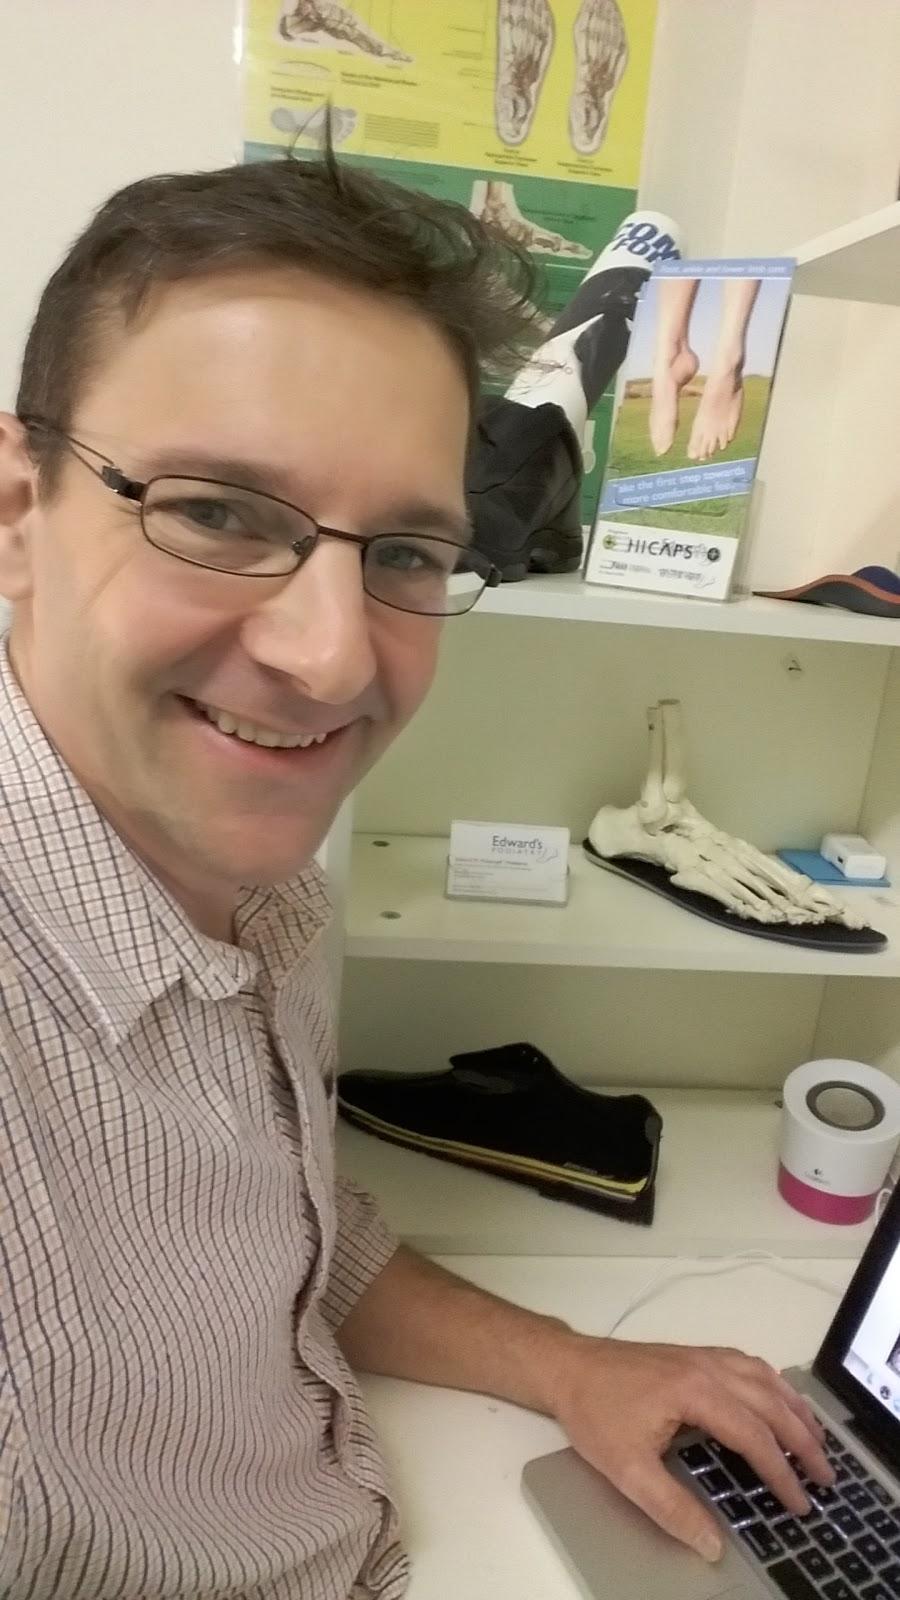 Edwards Podiatry - Kingsford | hospital | 1/5 Meeks St, Kingsford NSW 2032, Australia | 0414360469 OR +61 414 360 469